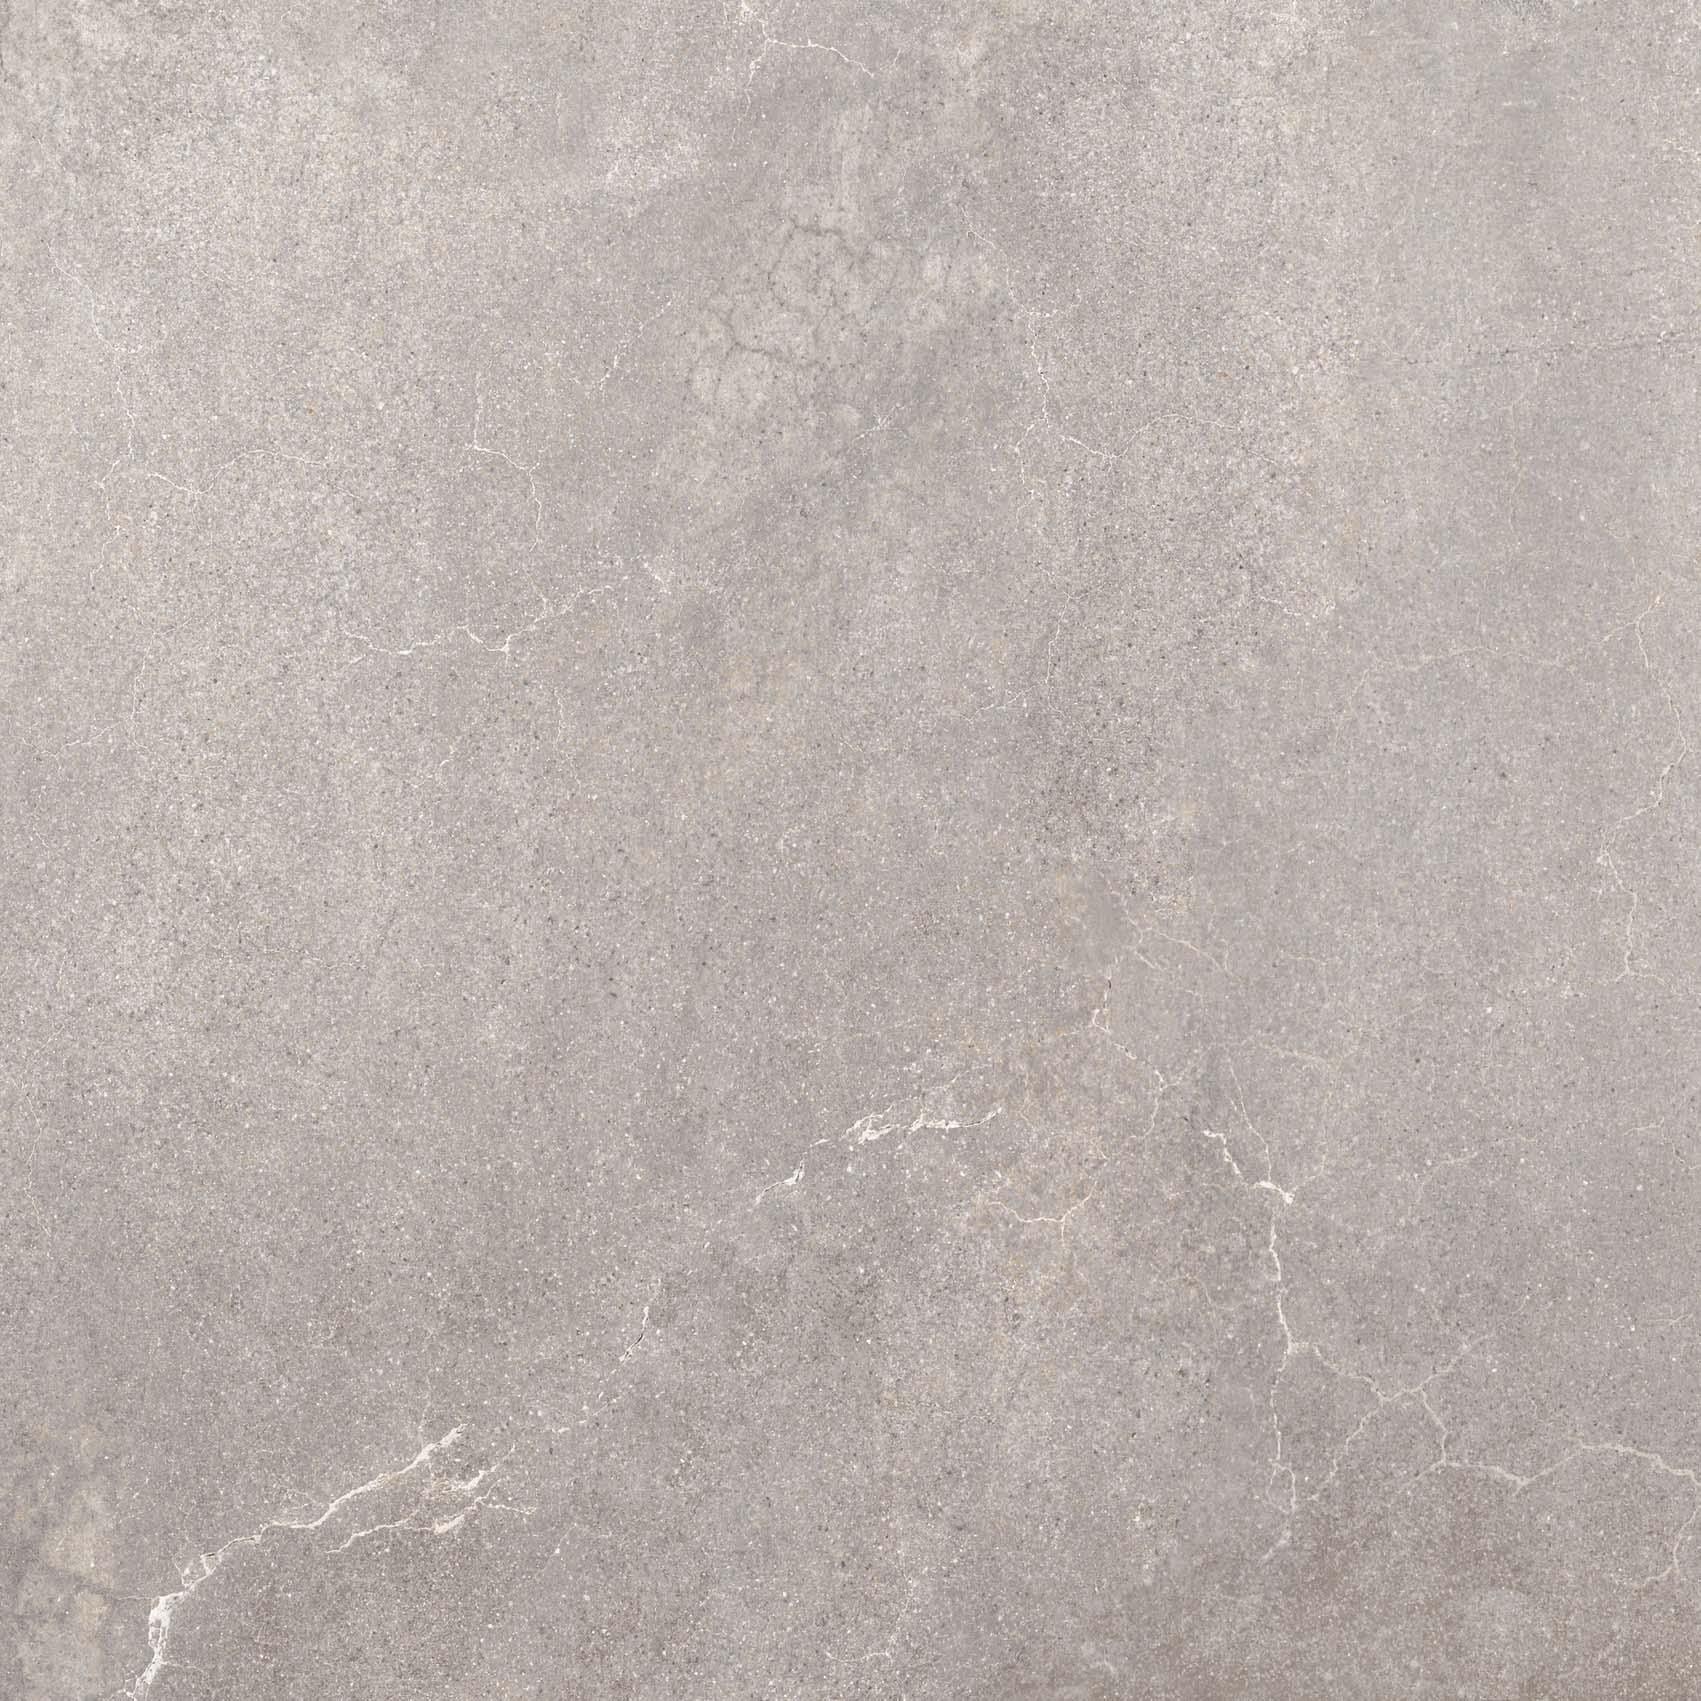 avenue gris matt floor. Black Bedroom Furniture Sets. Home Design Ideas